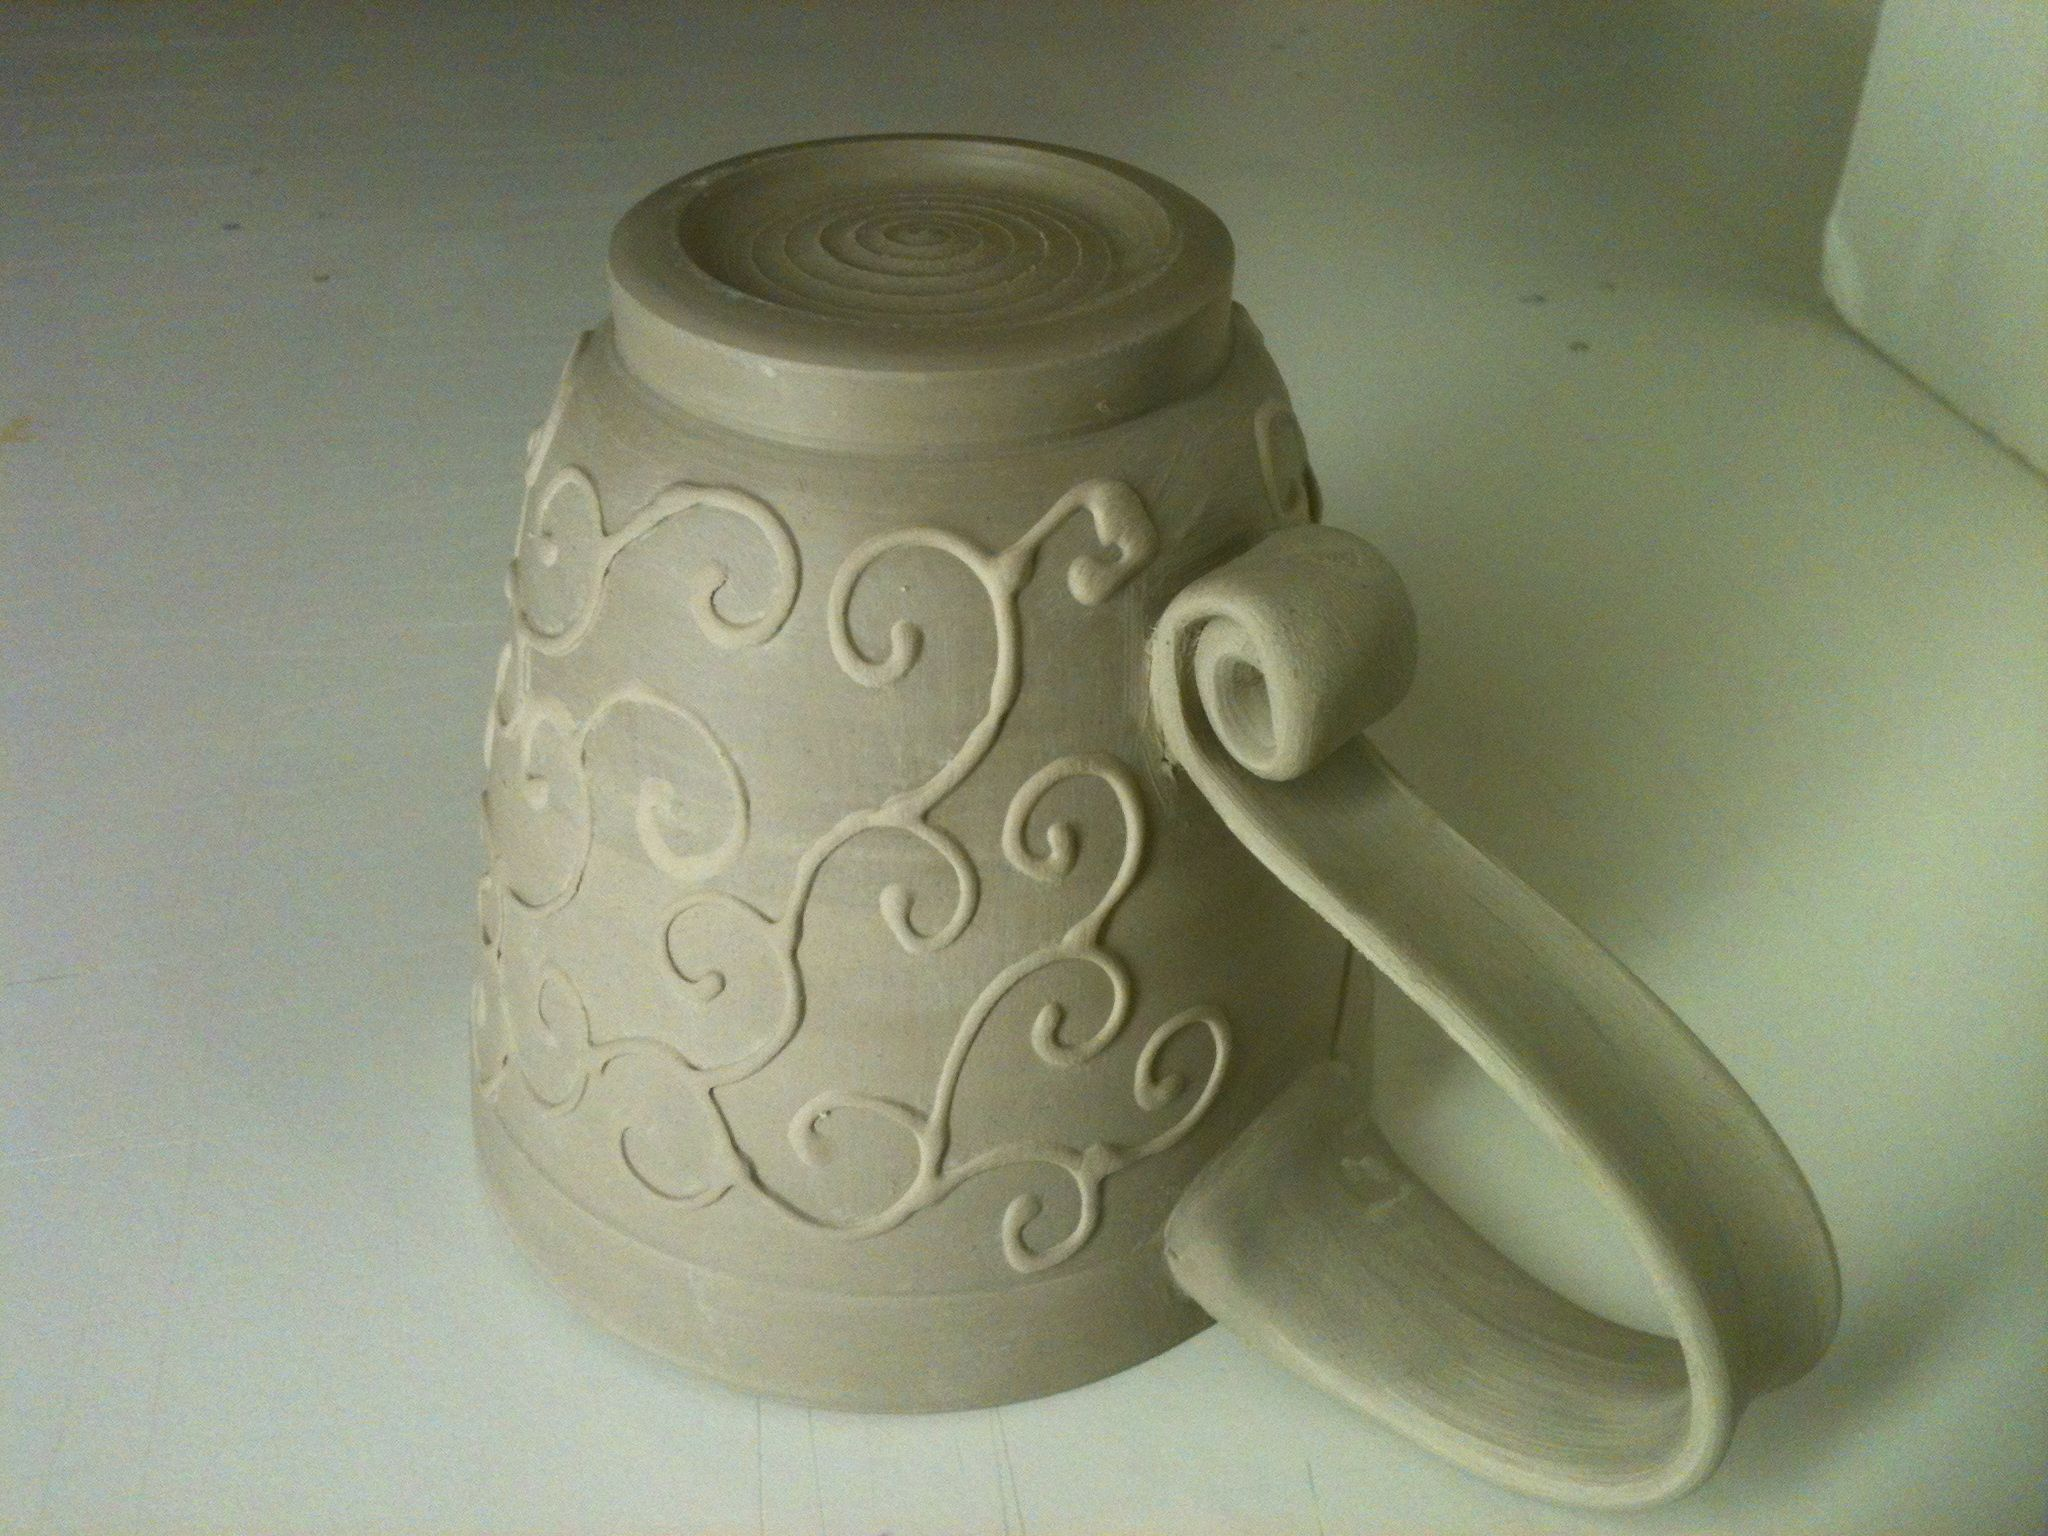 Fullsize Of Pottery Mug Handles